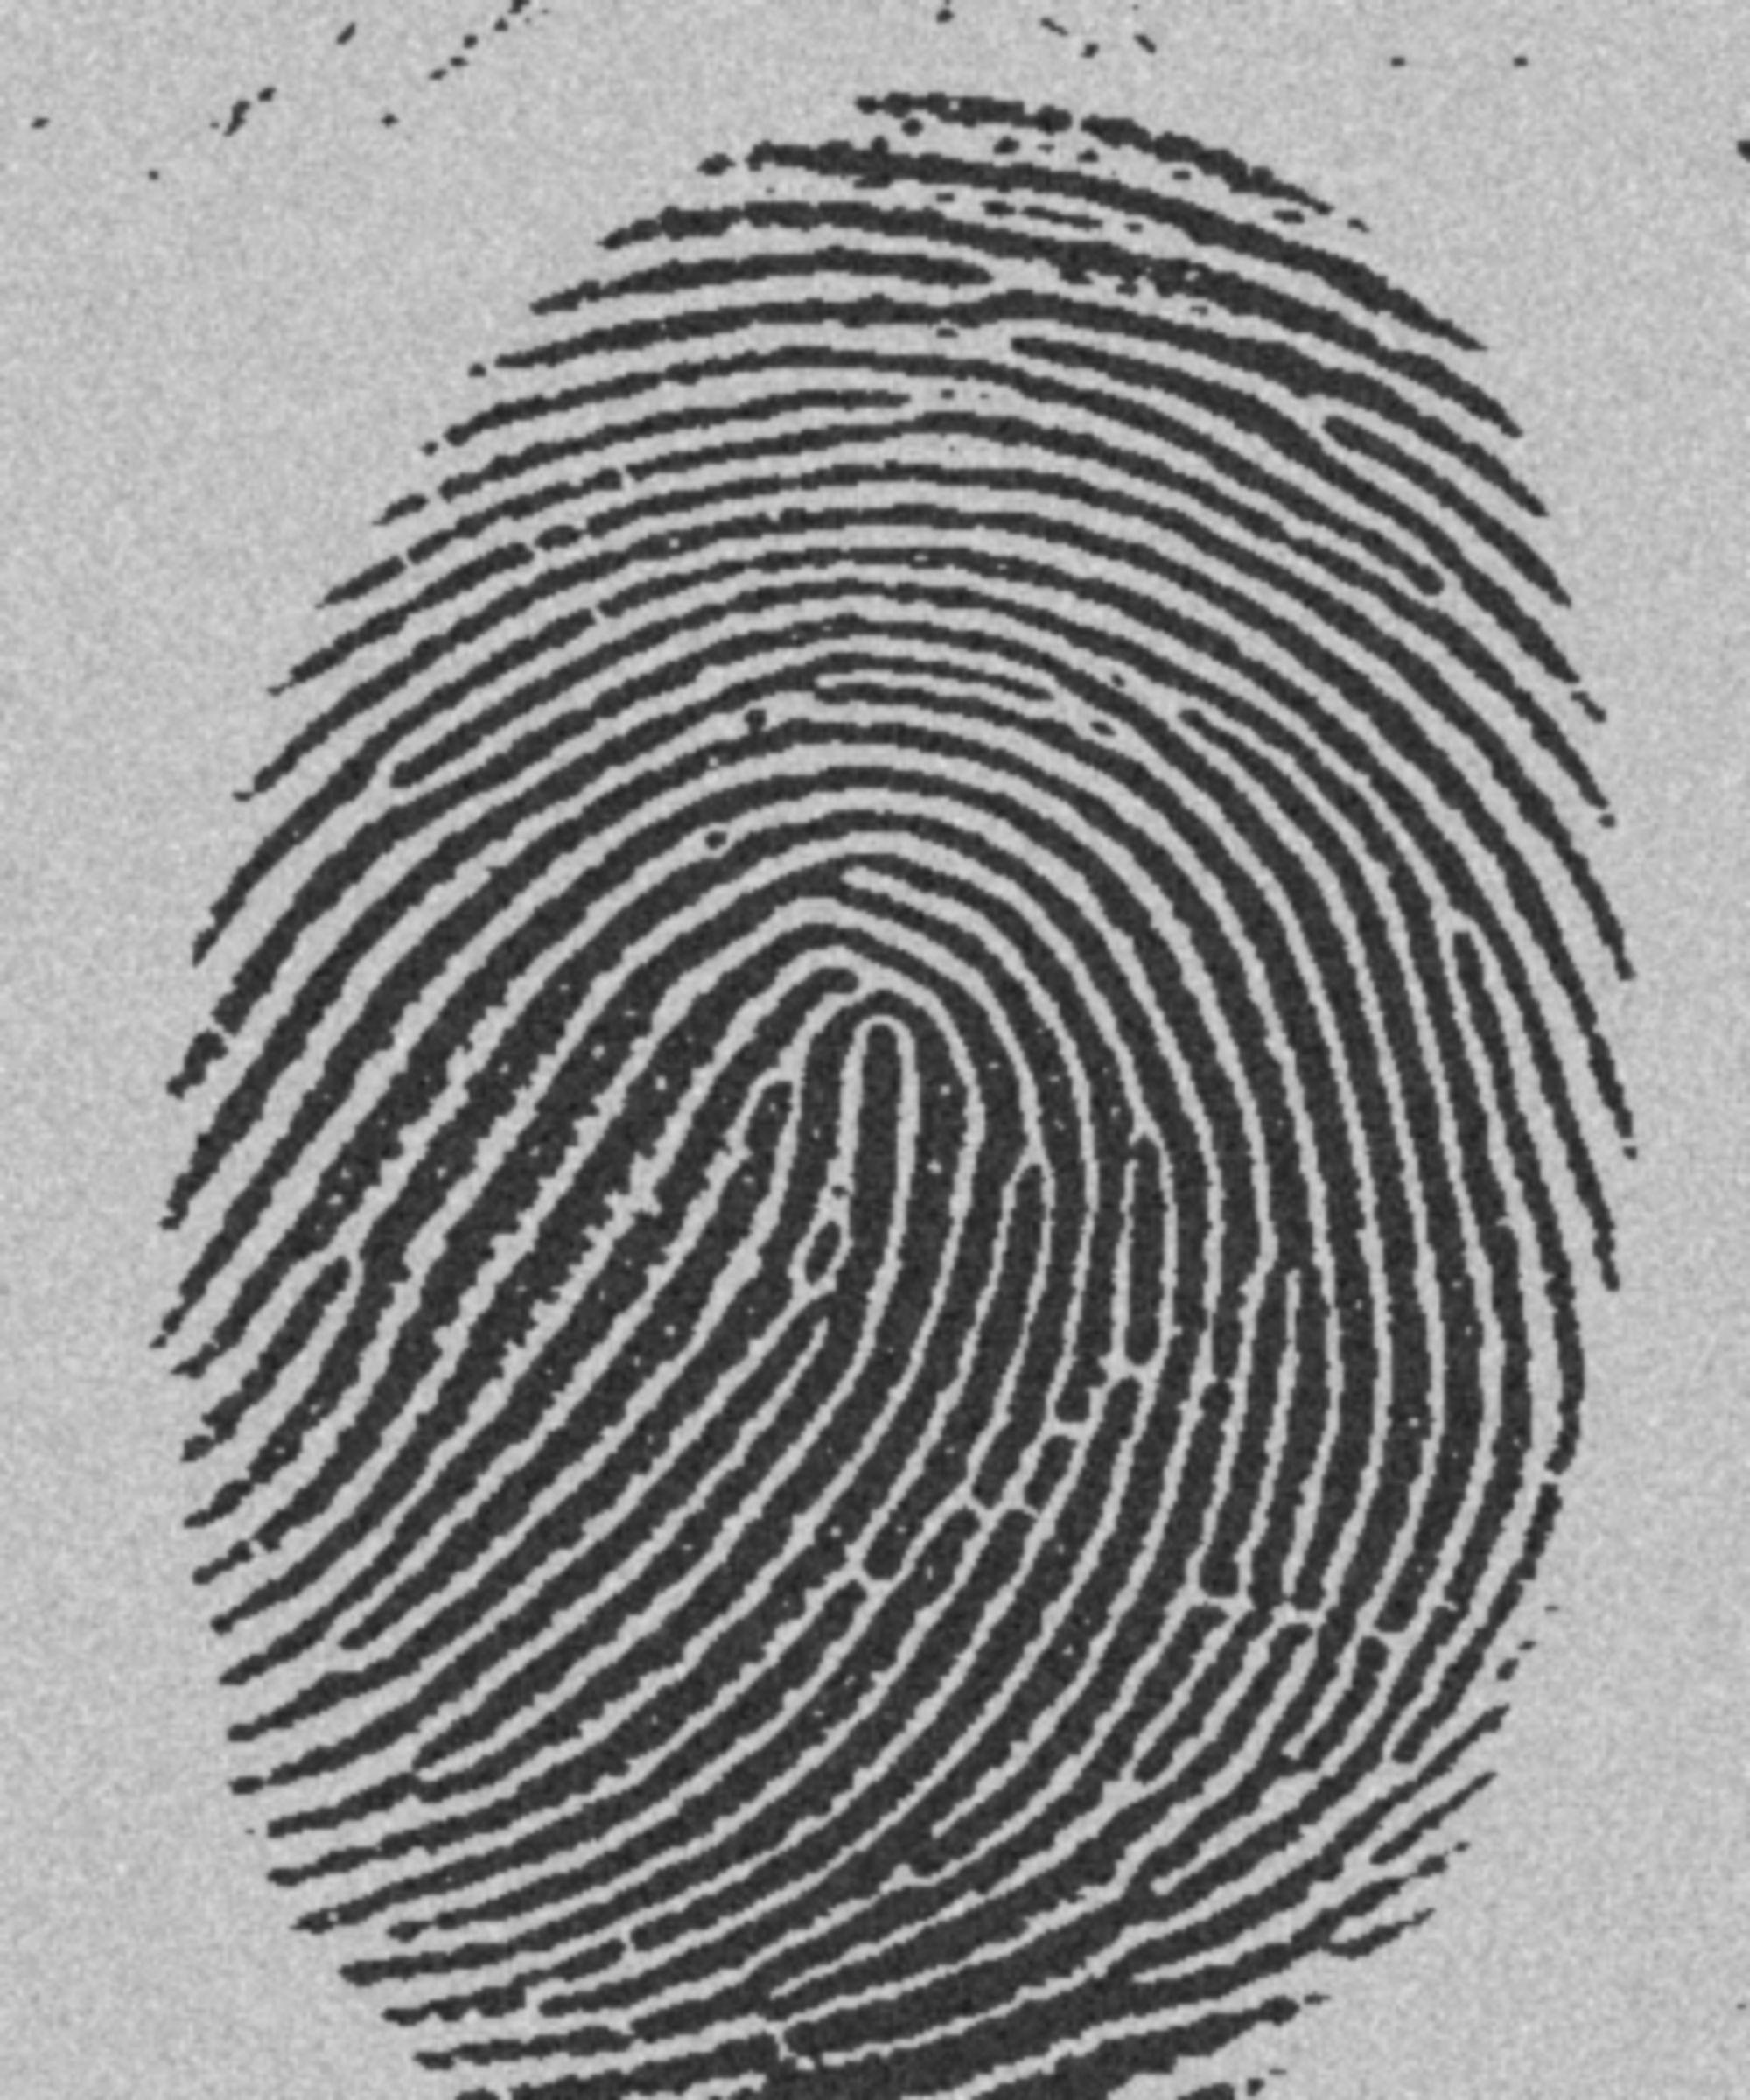 Sikrere digital ID